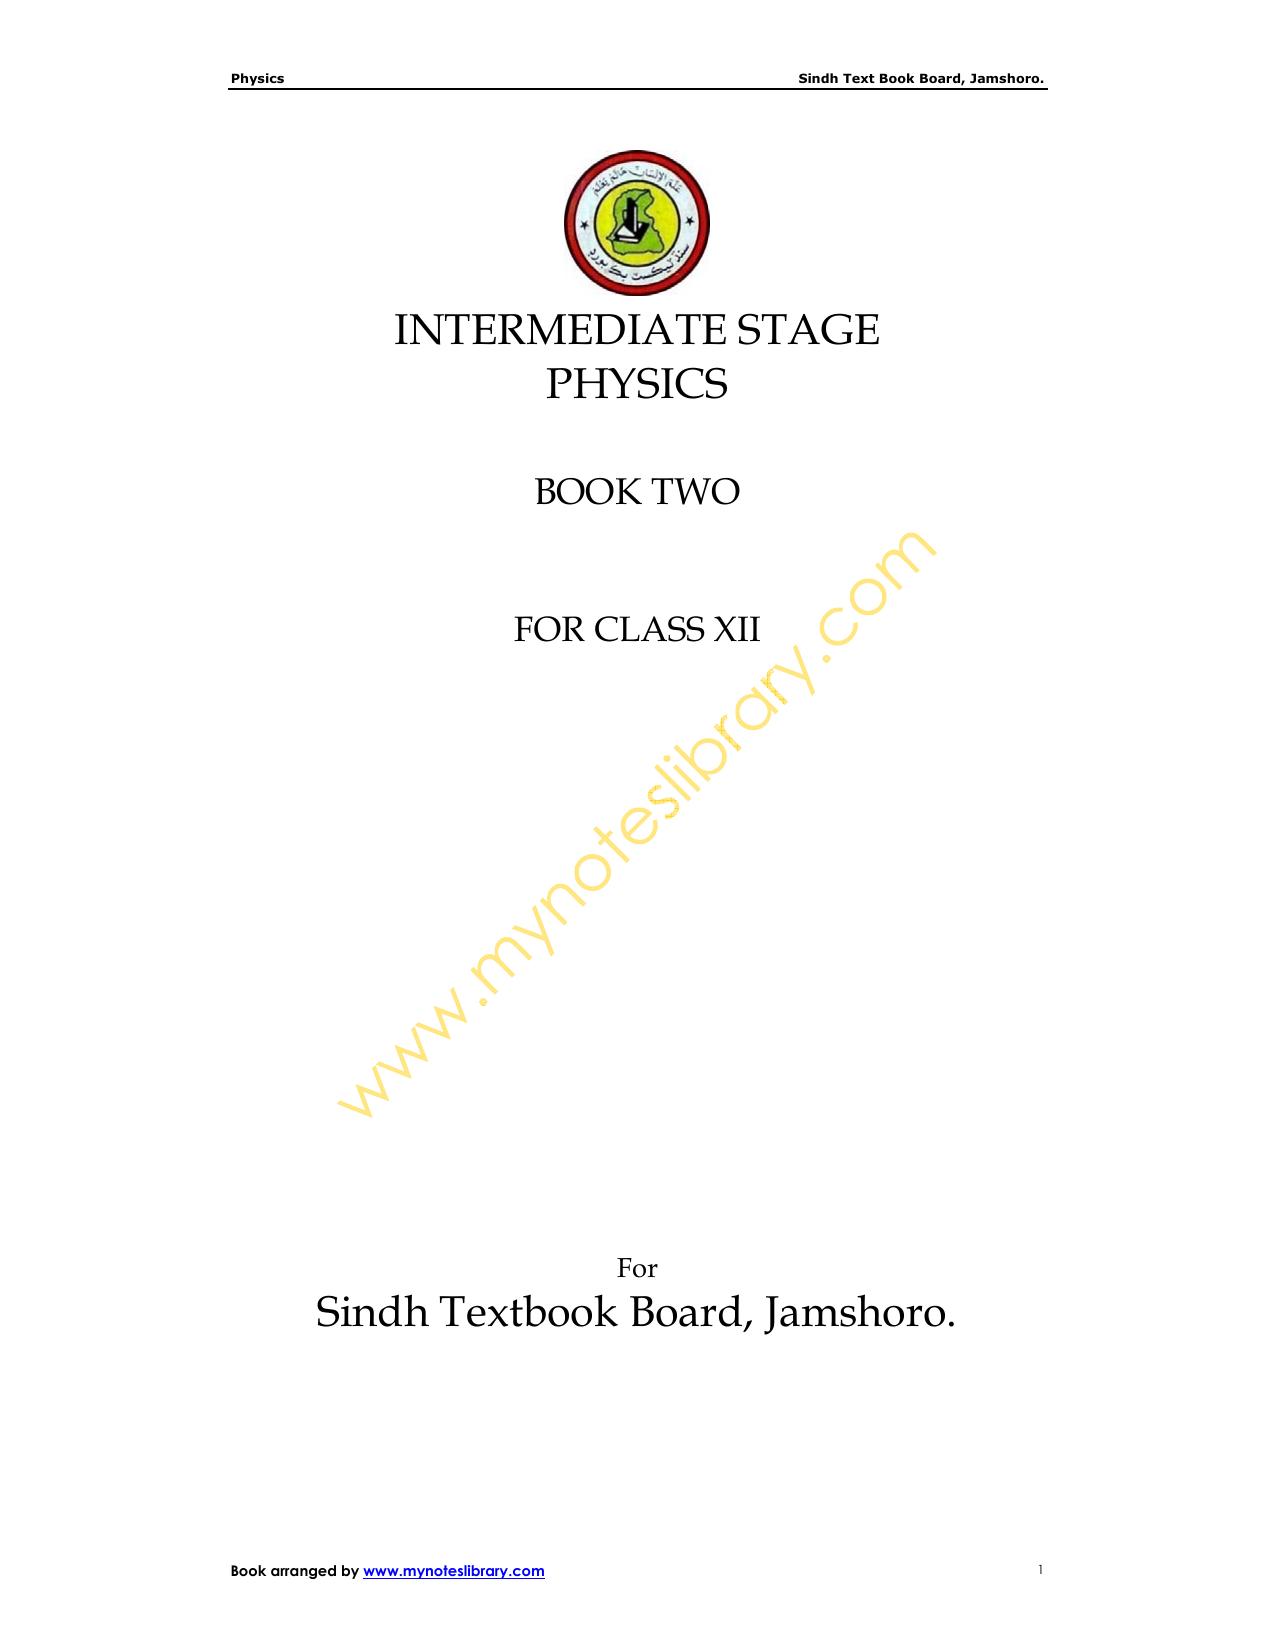 INTERMEDIATE STAGE PHYSICS Sindh Textbook Board, Jamshoro